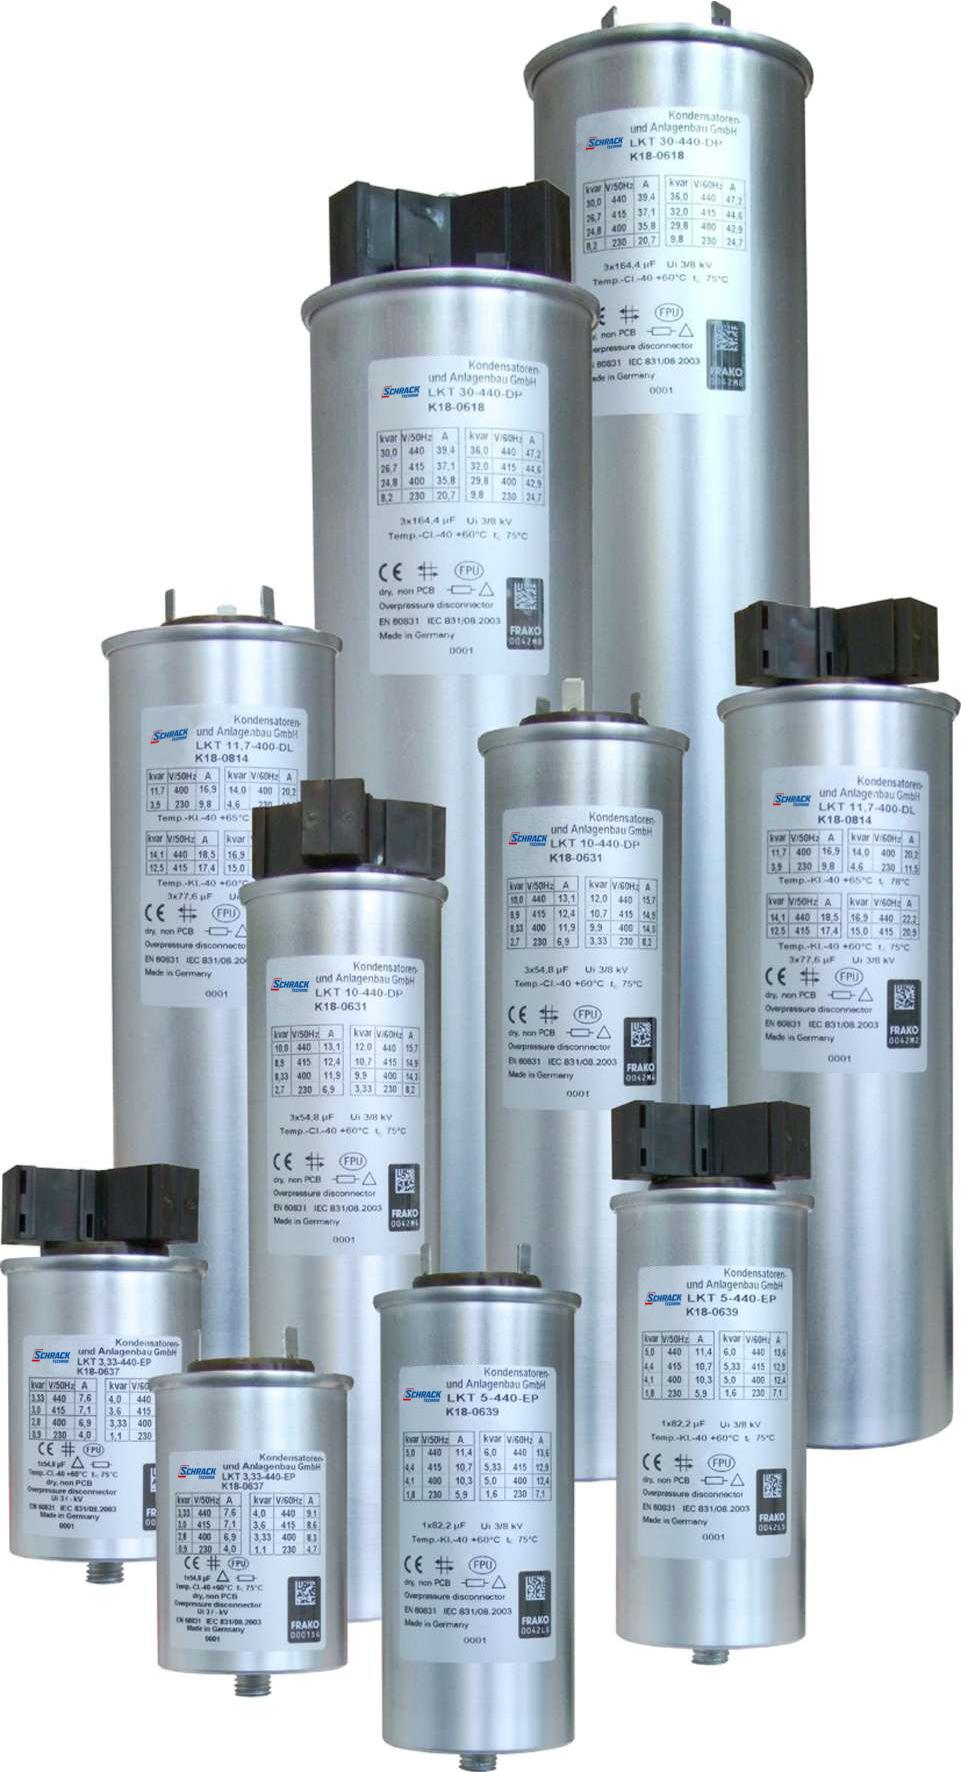 1 Stk Leistungskondensator 440V Qc=20,7kvar (400V) Qc=25kvar(440V) FRLK25044B